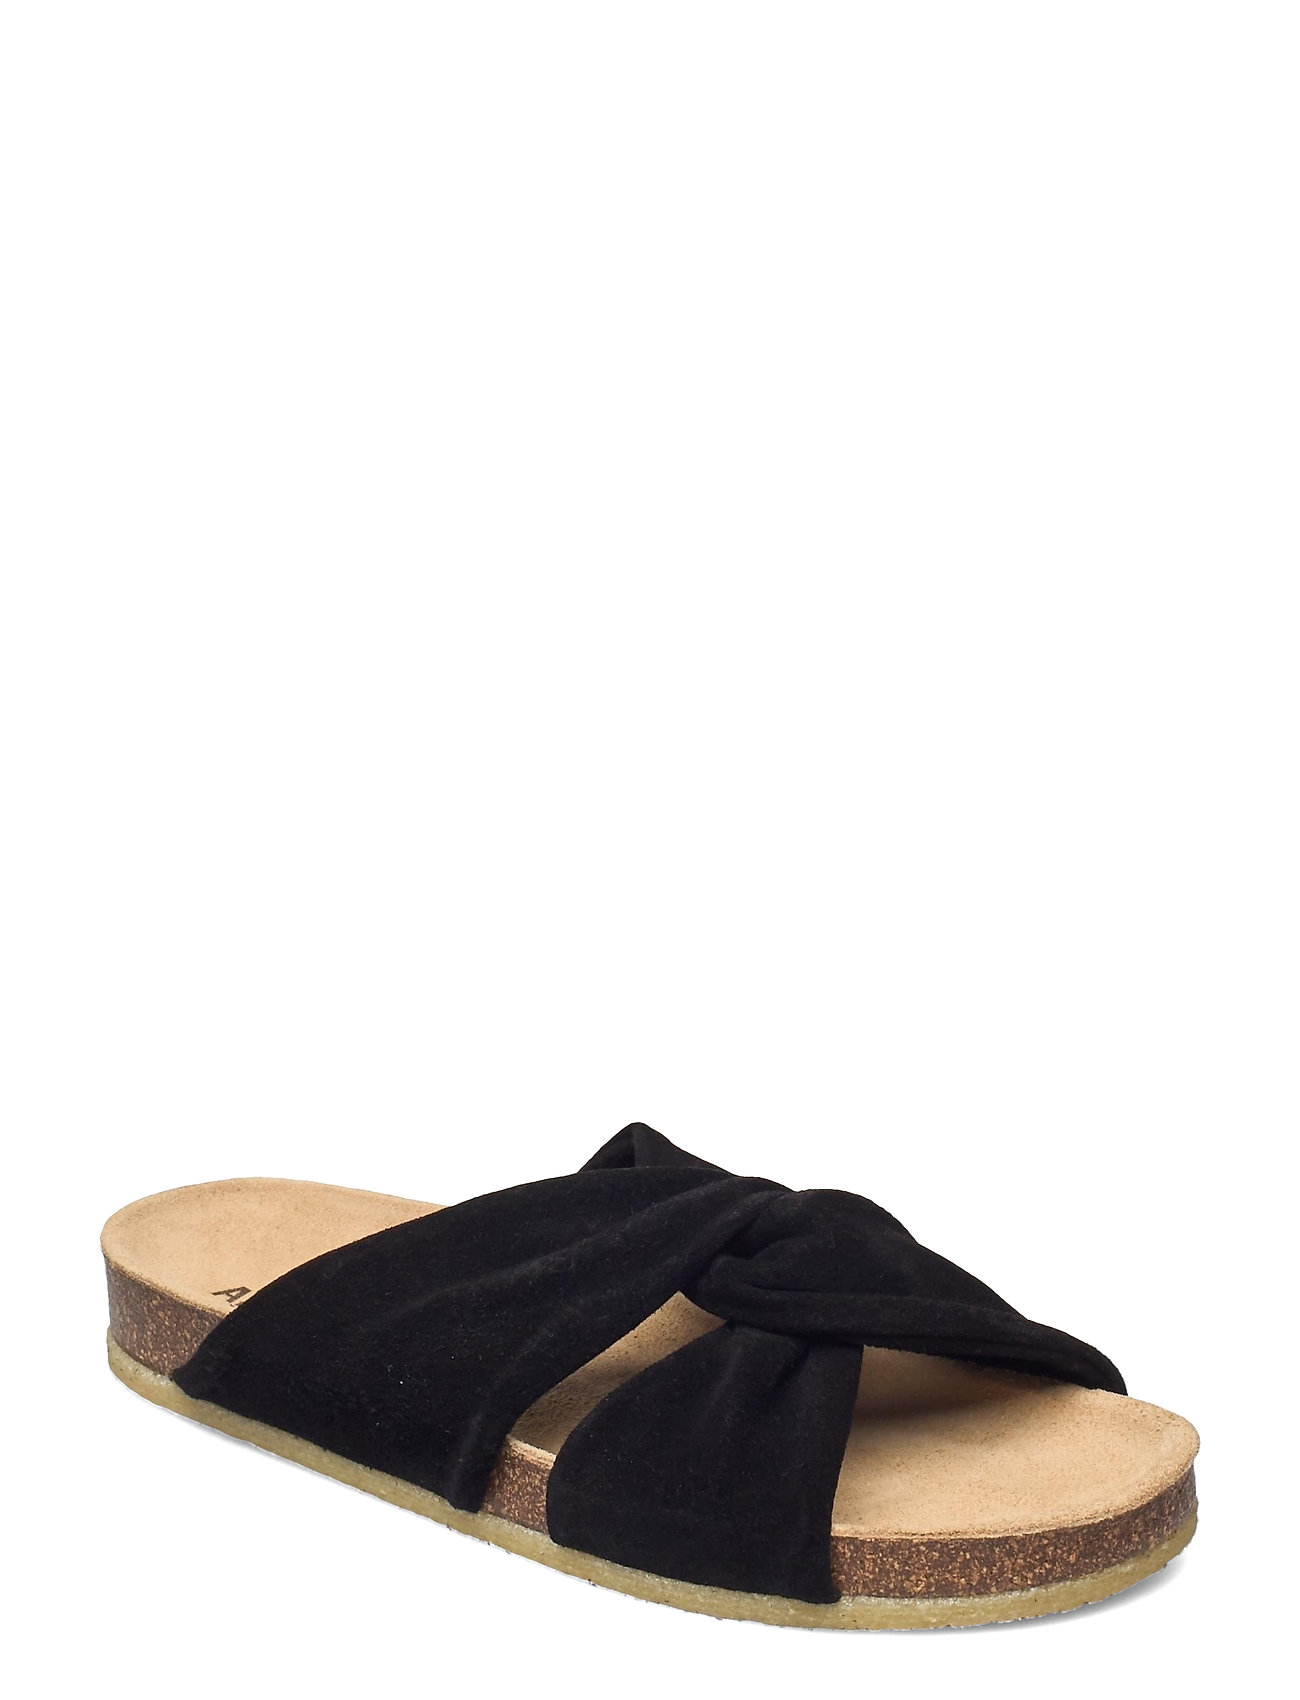 Sandals - Flat - Open Toe - Op Shoes Summer Shoes Flat Sandals Sort ANGULUS